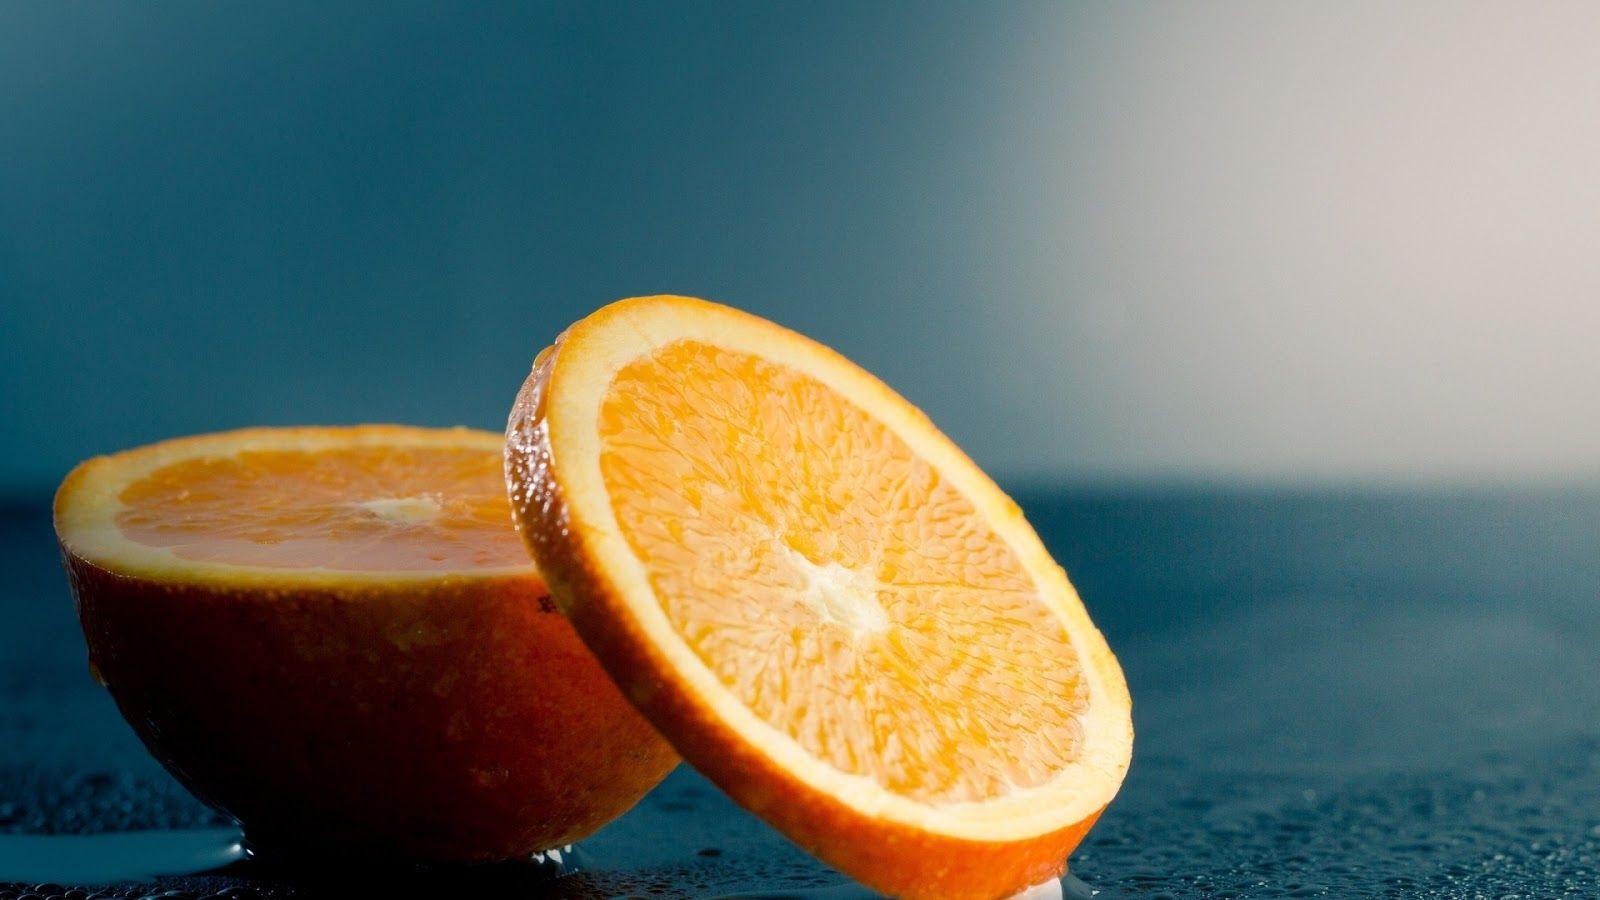 Desktop Cool Hd Wall Papers Fruit Wallpaper Orange Water Orange